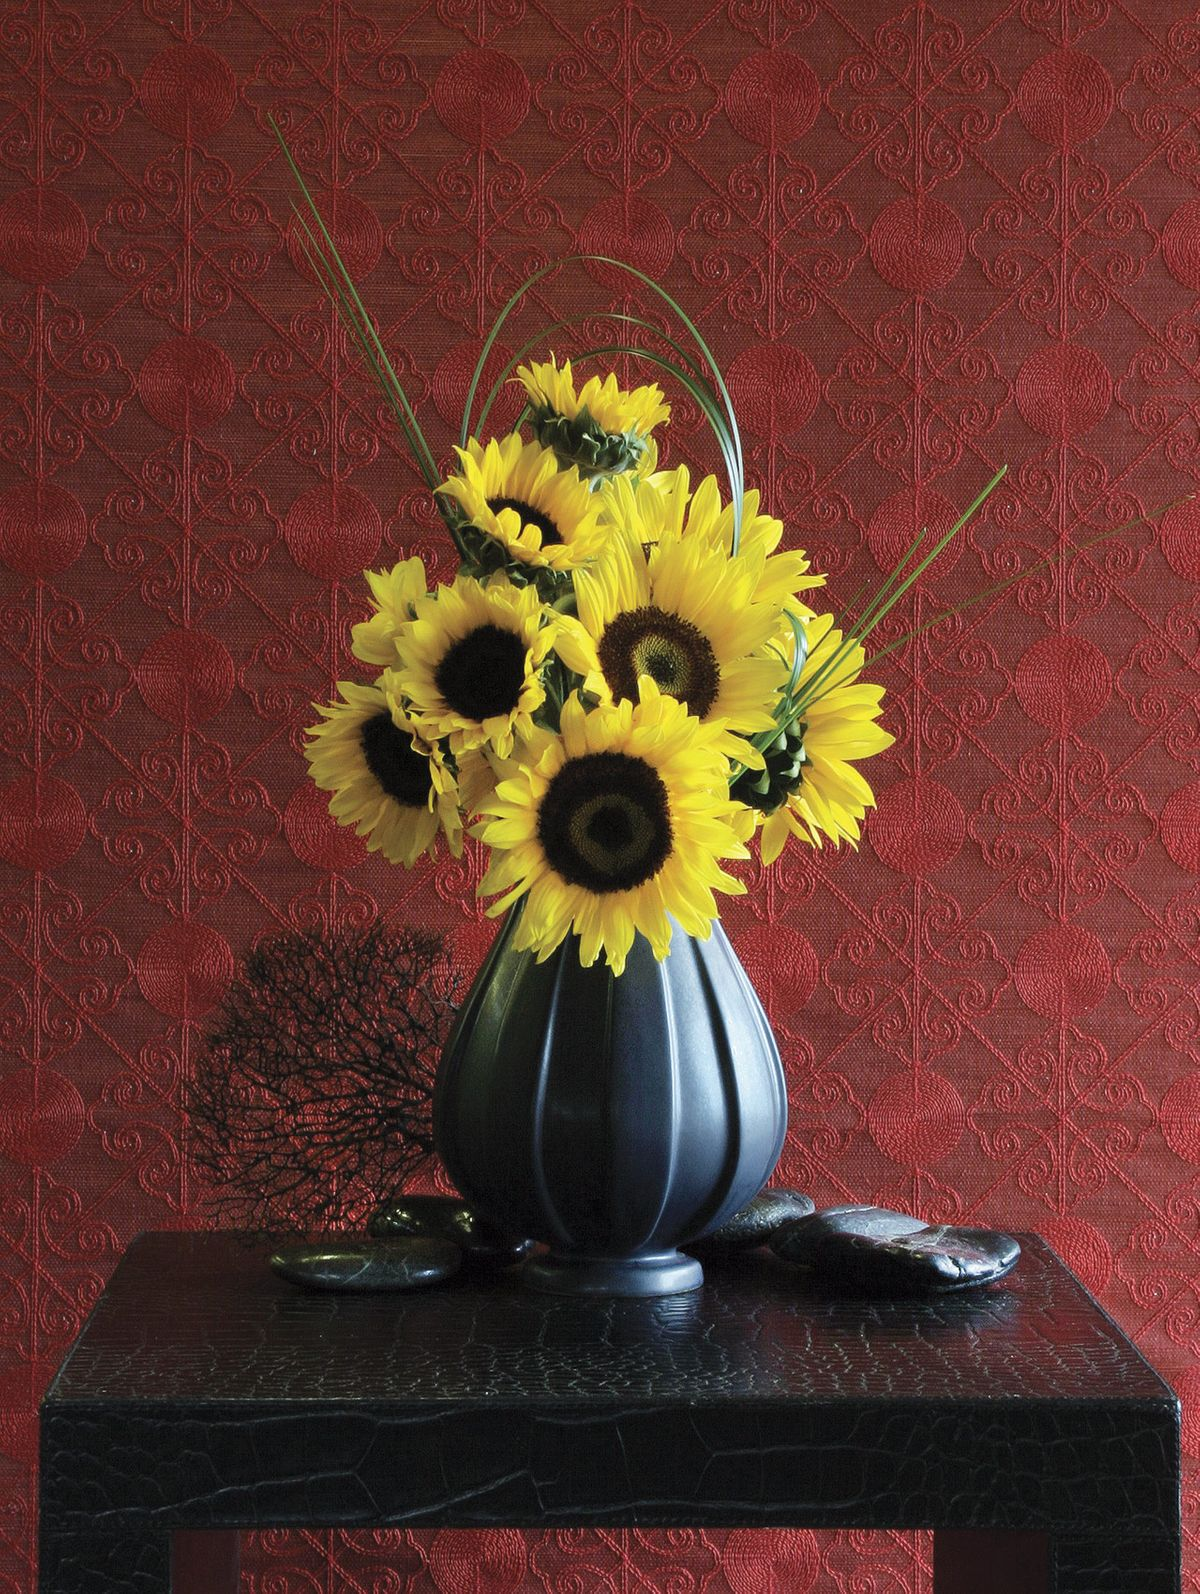 ChristopherWhite_HamptonsCottageandGardens_Sunflower-CYMK1.jpg